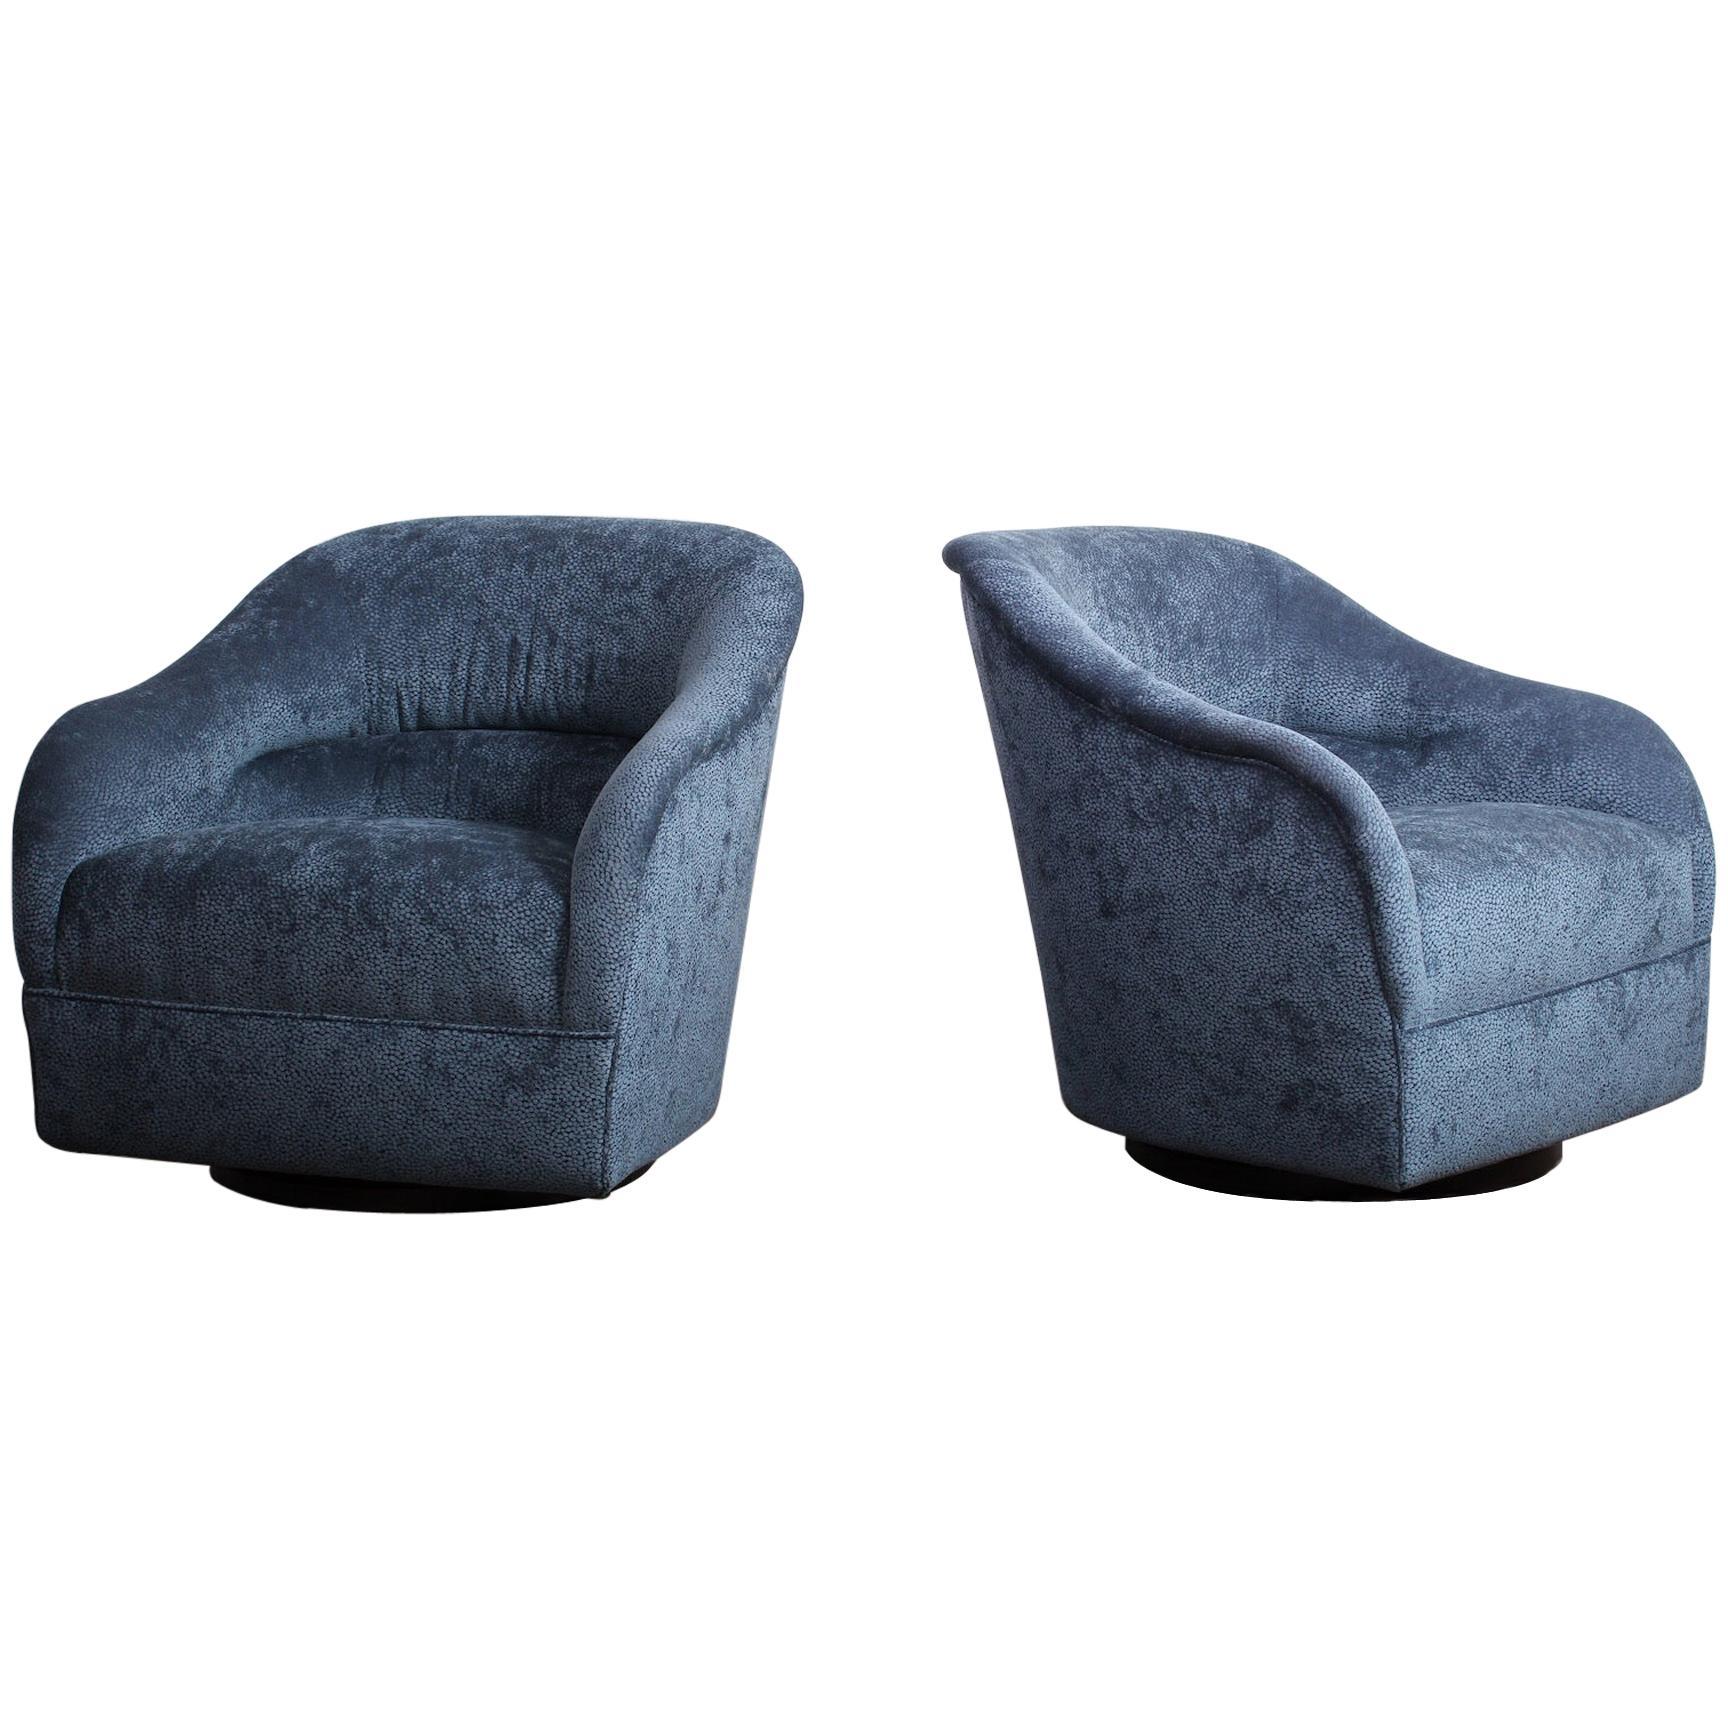 Pair of Ward Bennett Swivel Chairs